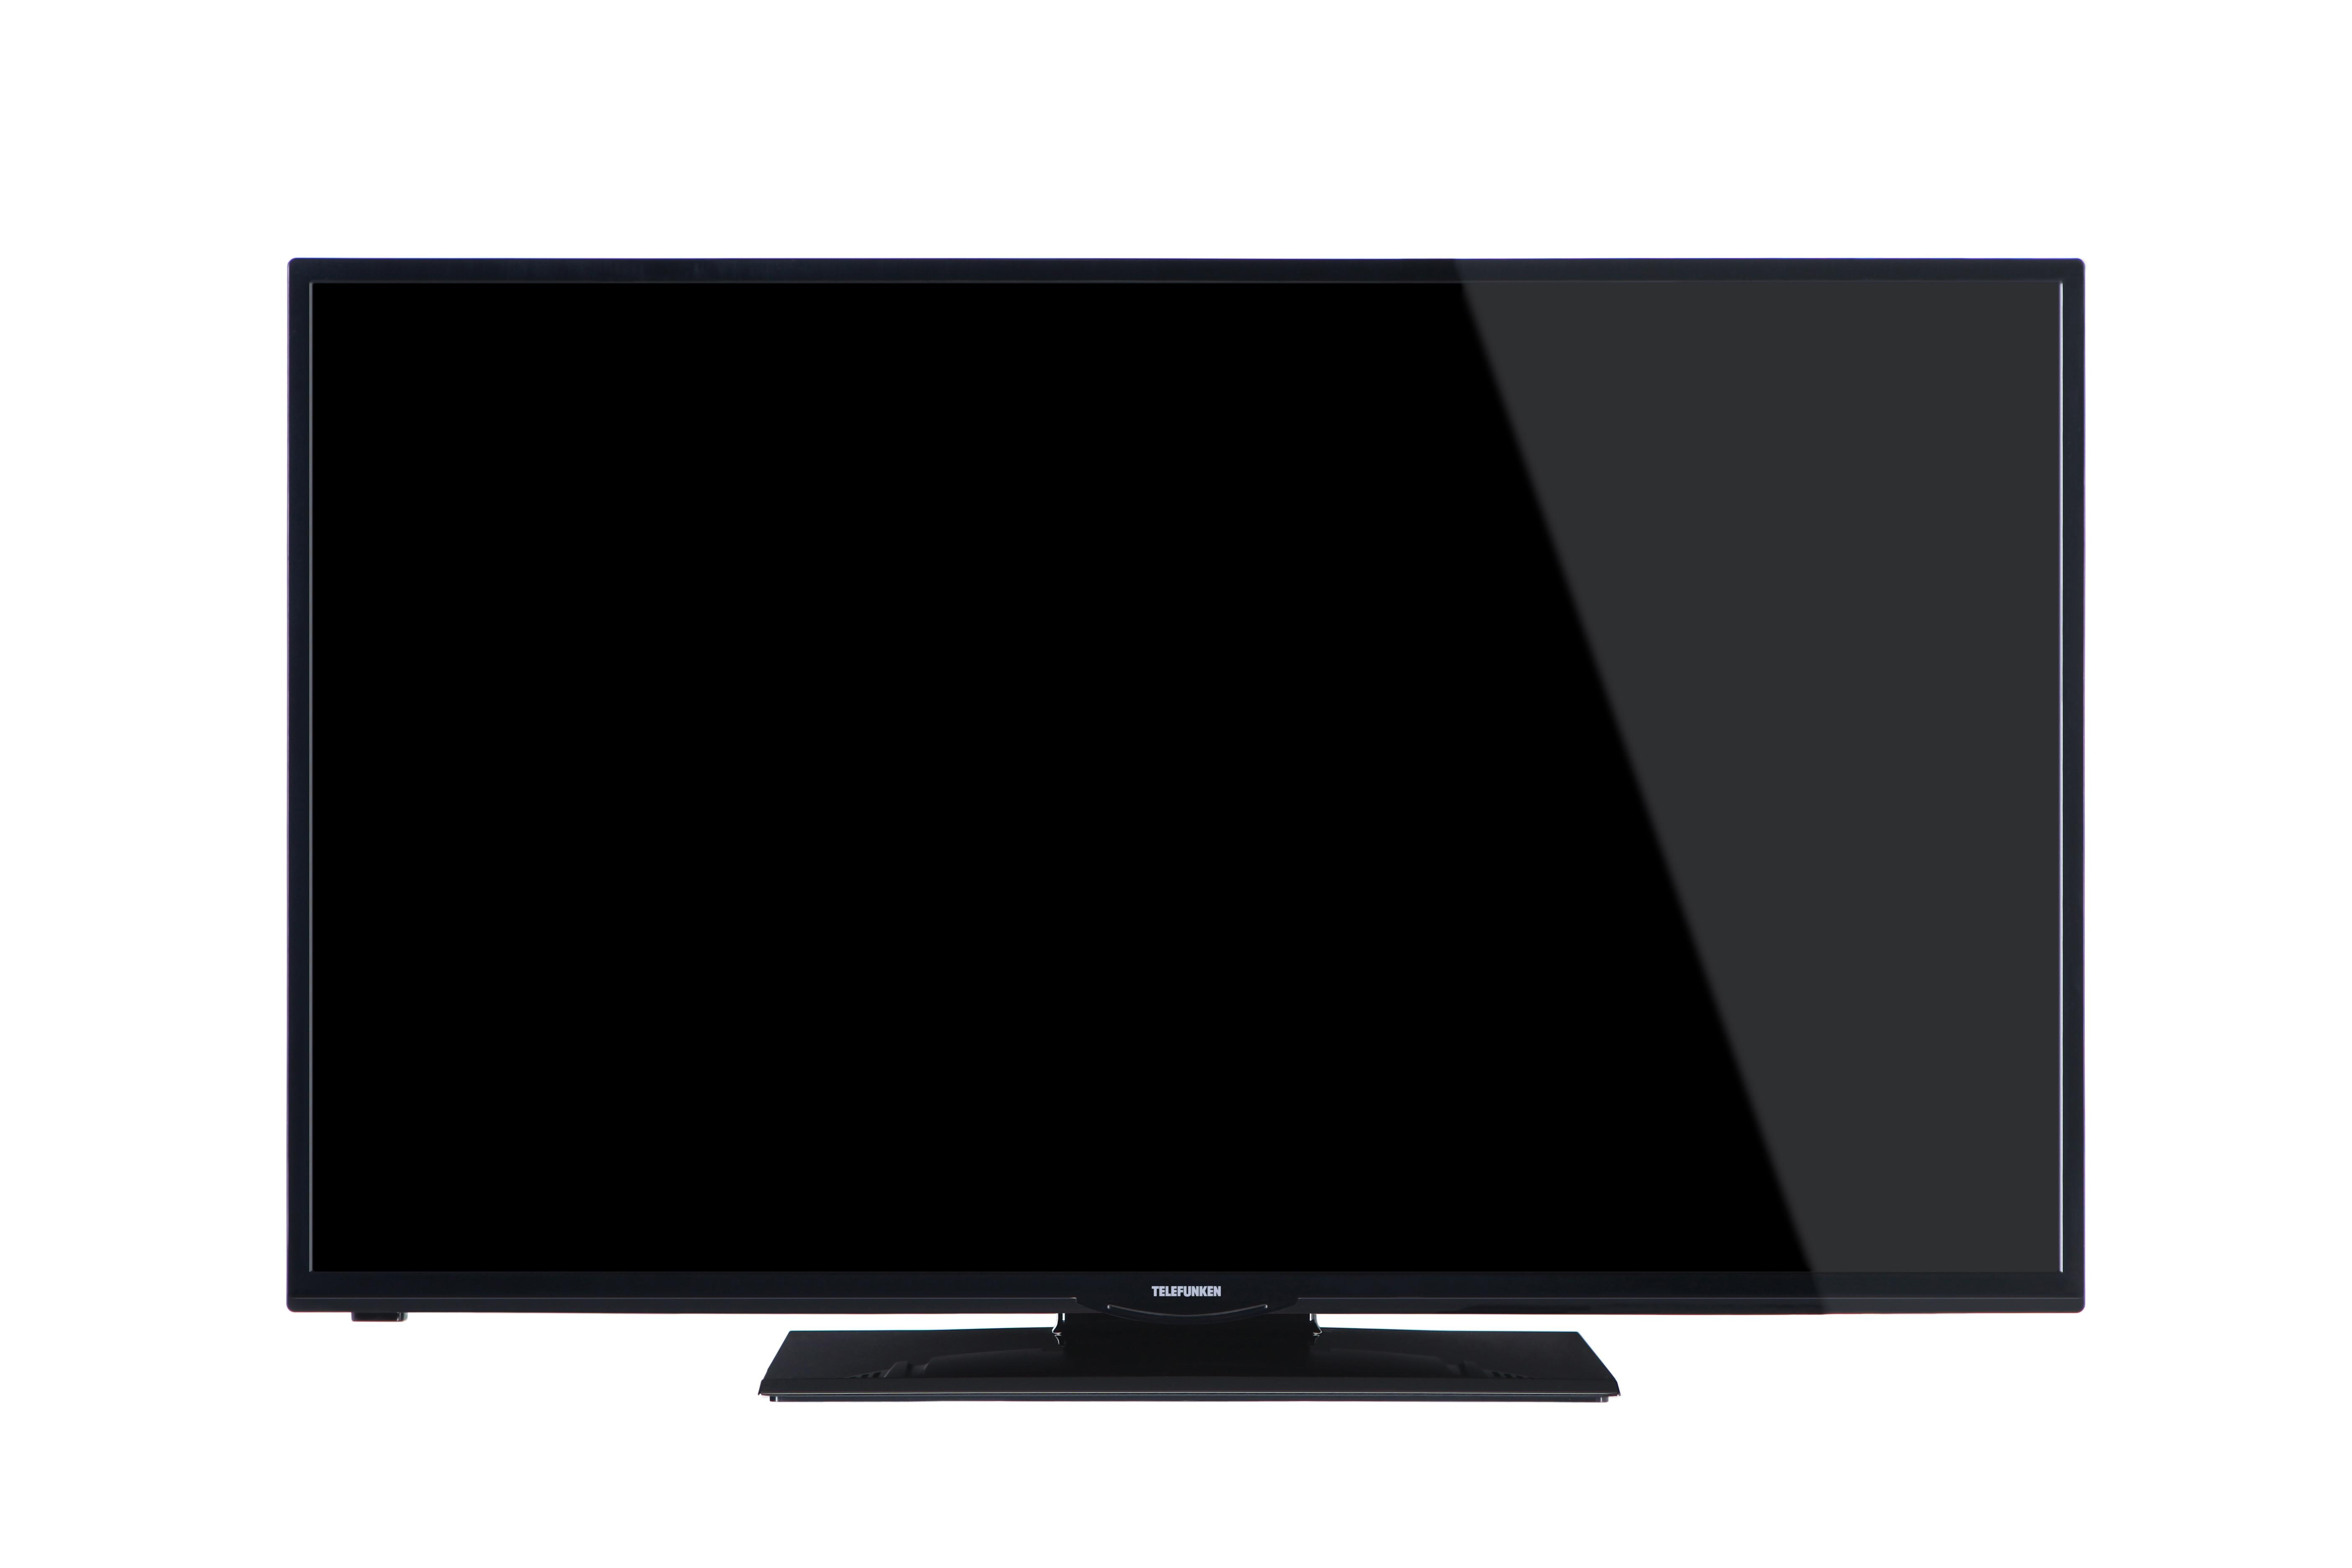 telefunken xf39a300 99 cm 39 zoll fernseher full hd triple tuner smart tv schwarz amazon. Black Bedroom Furniture Sets. Home Design Ideas